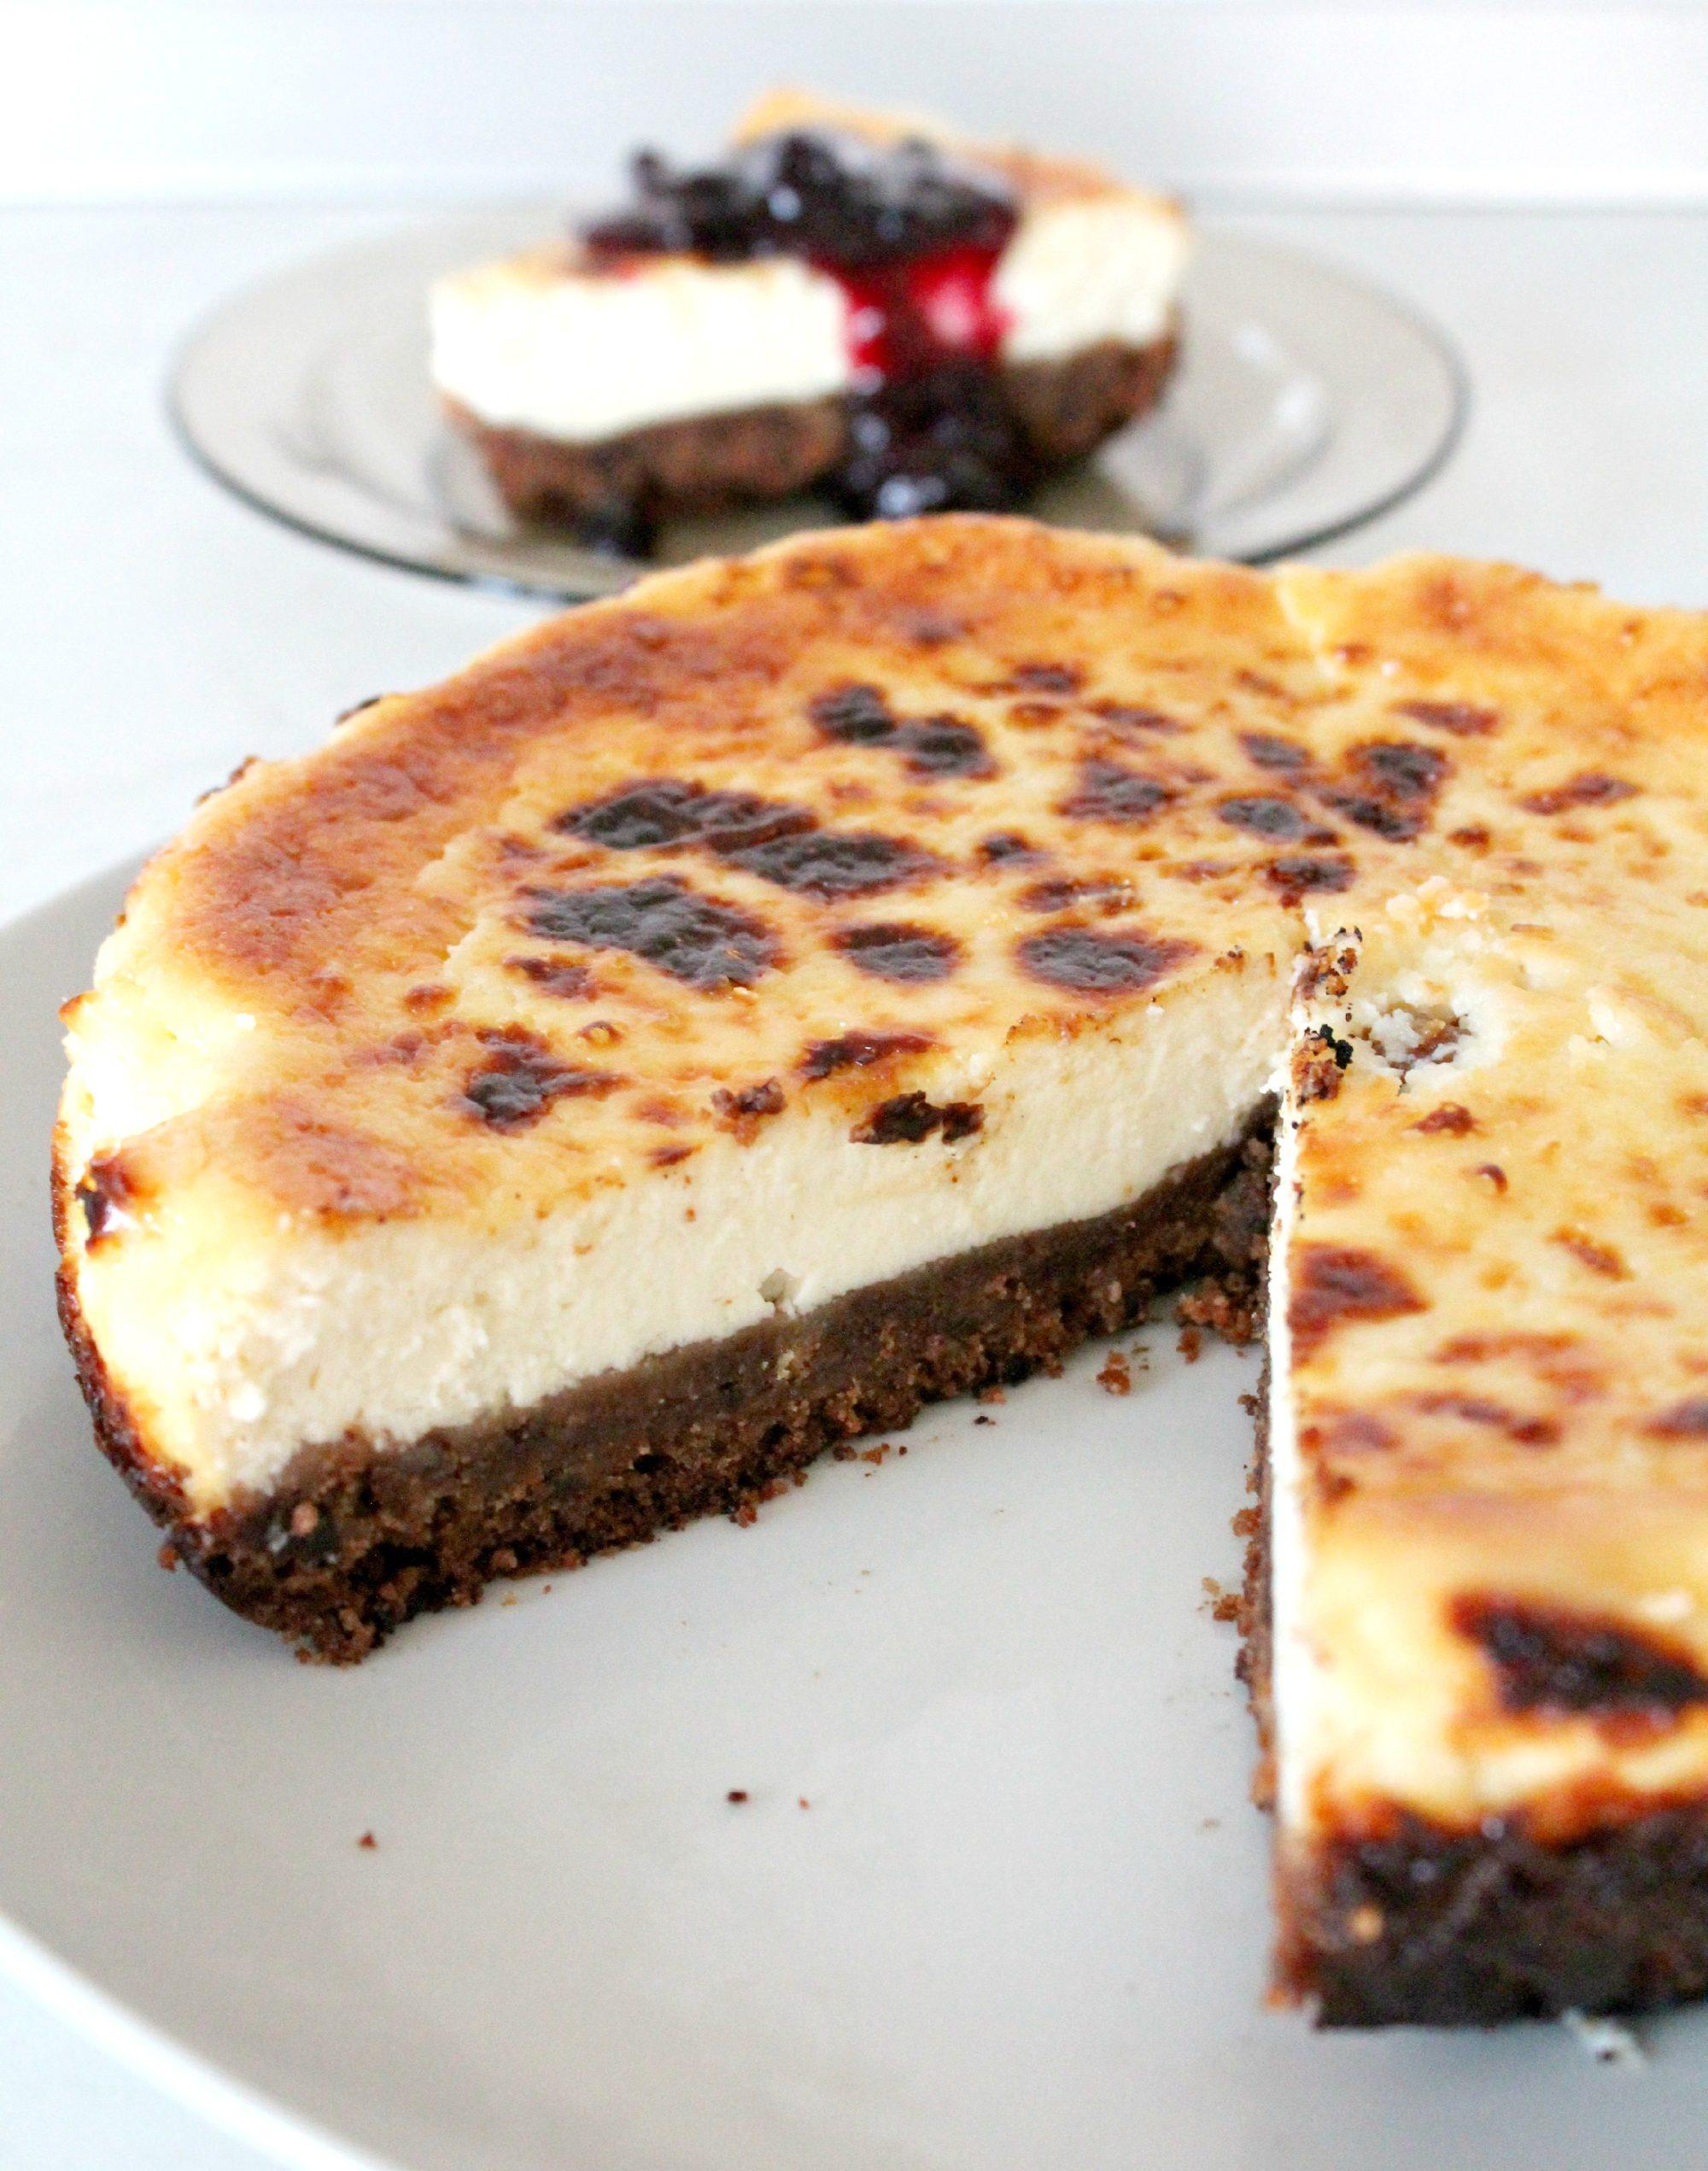 Gluten free chocolate chip cookie cheesecake